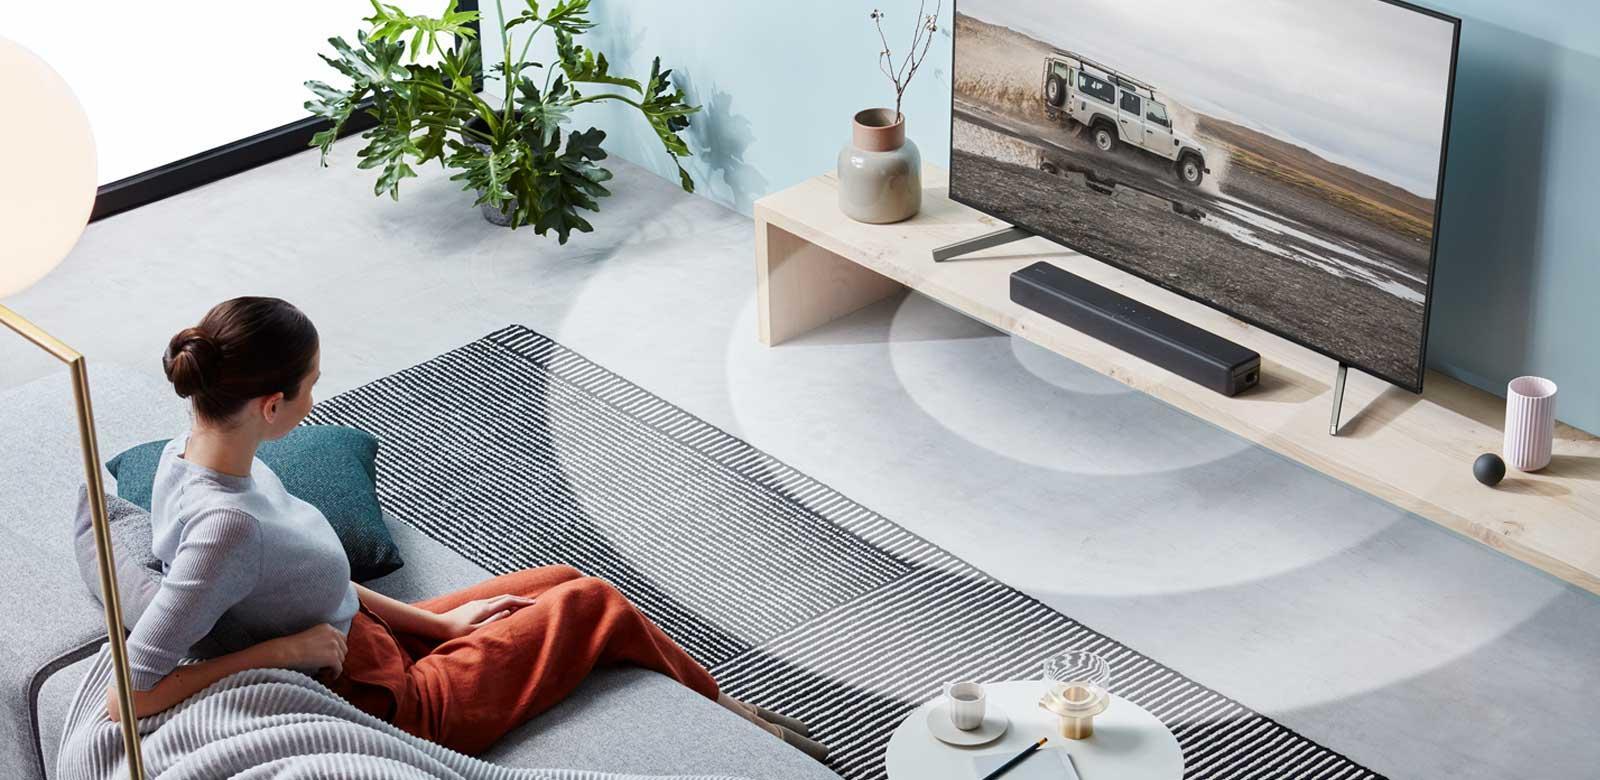 Sony HTSF200 2018 Soundbar Breaks Cover